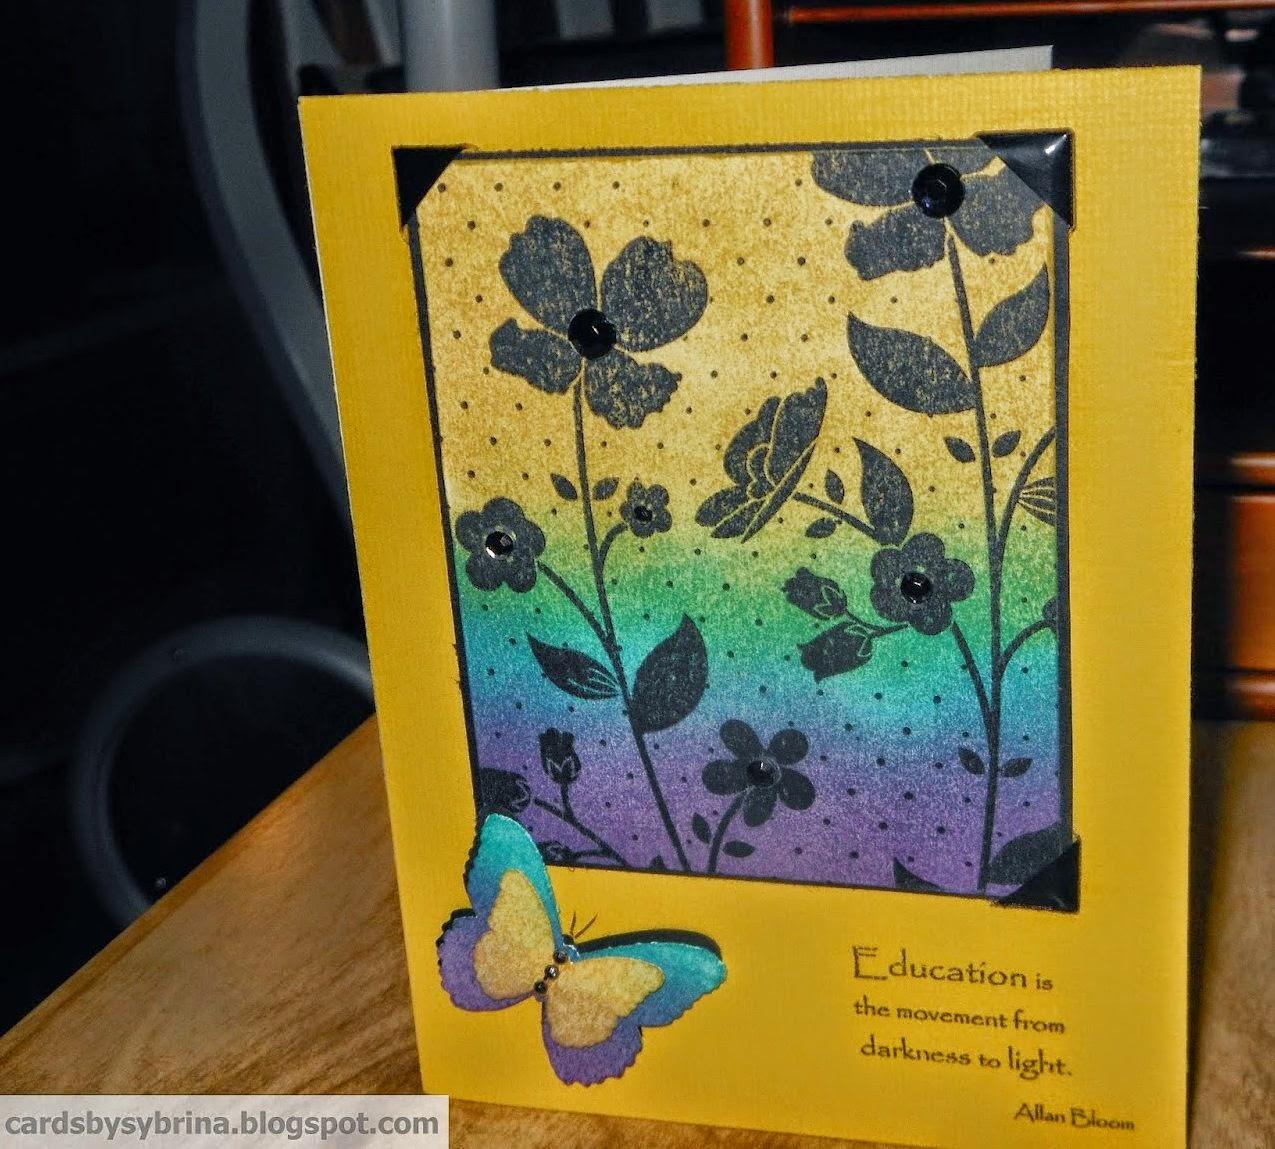 http://cardsbysybrina.blogspot.com/